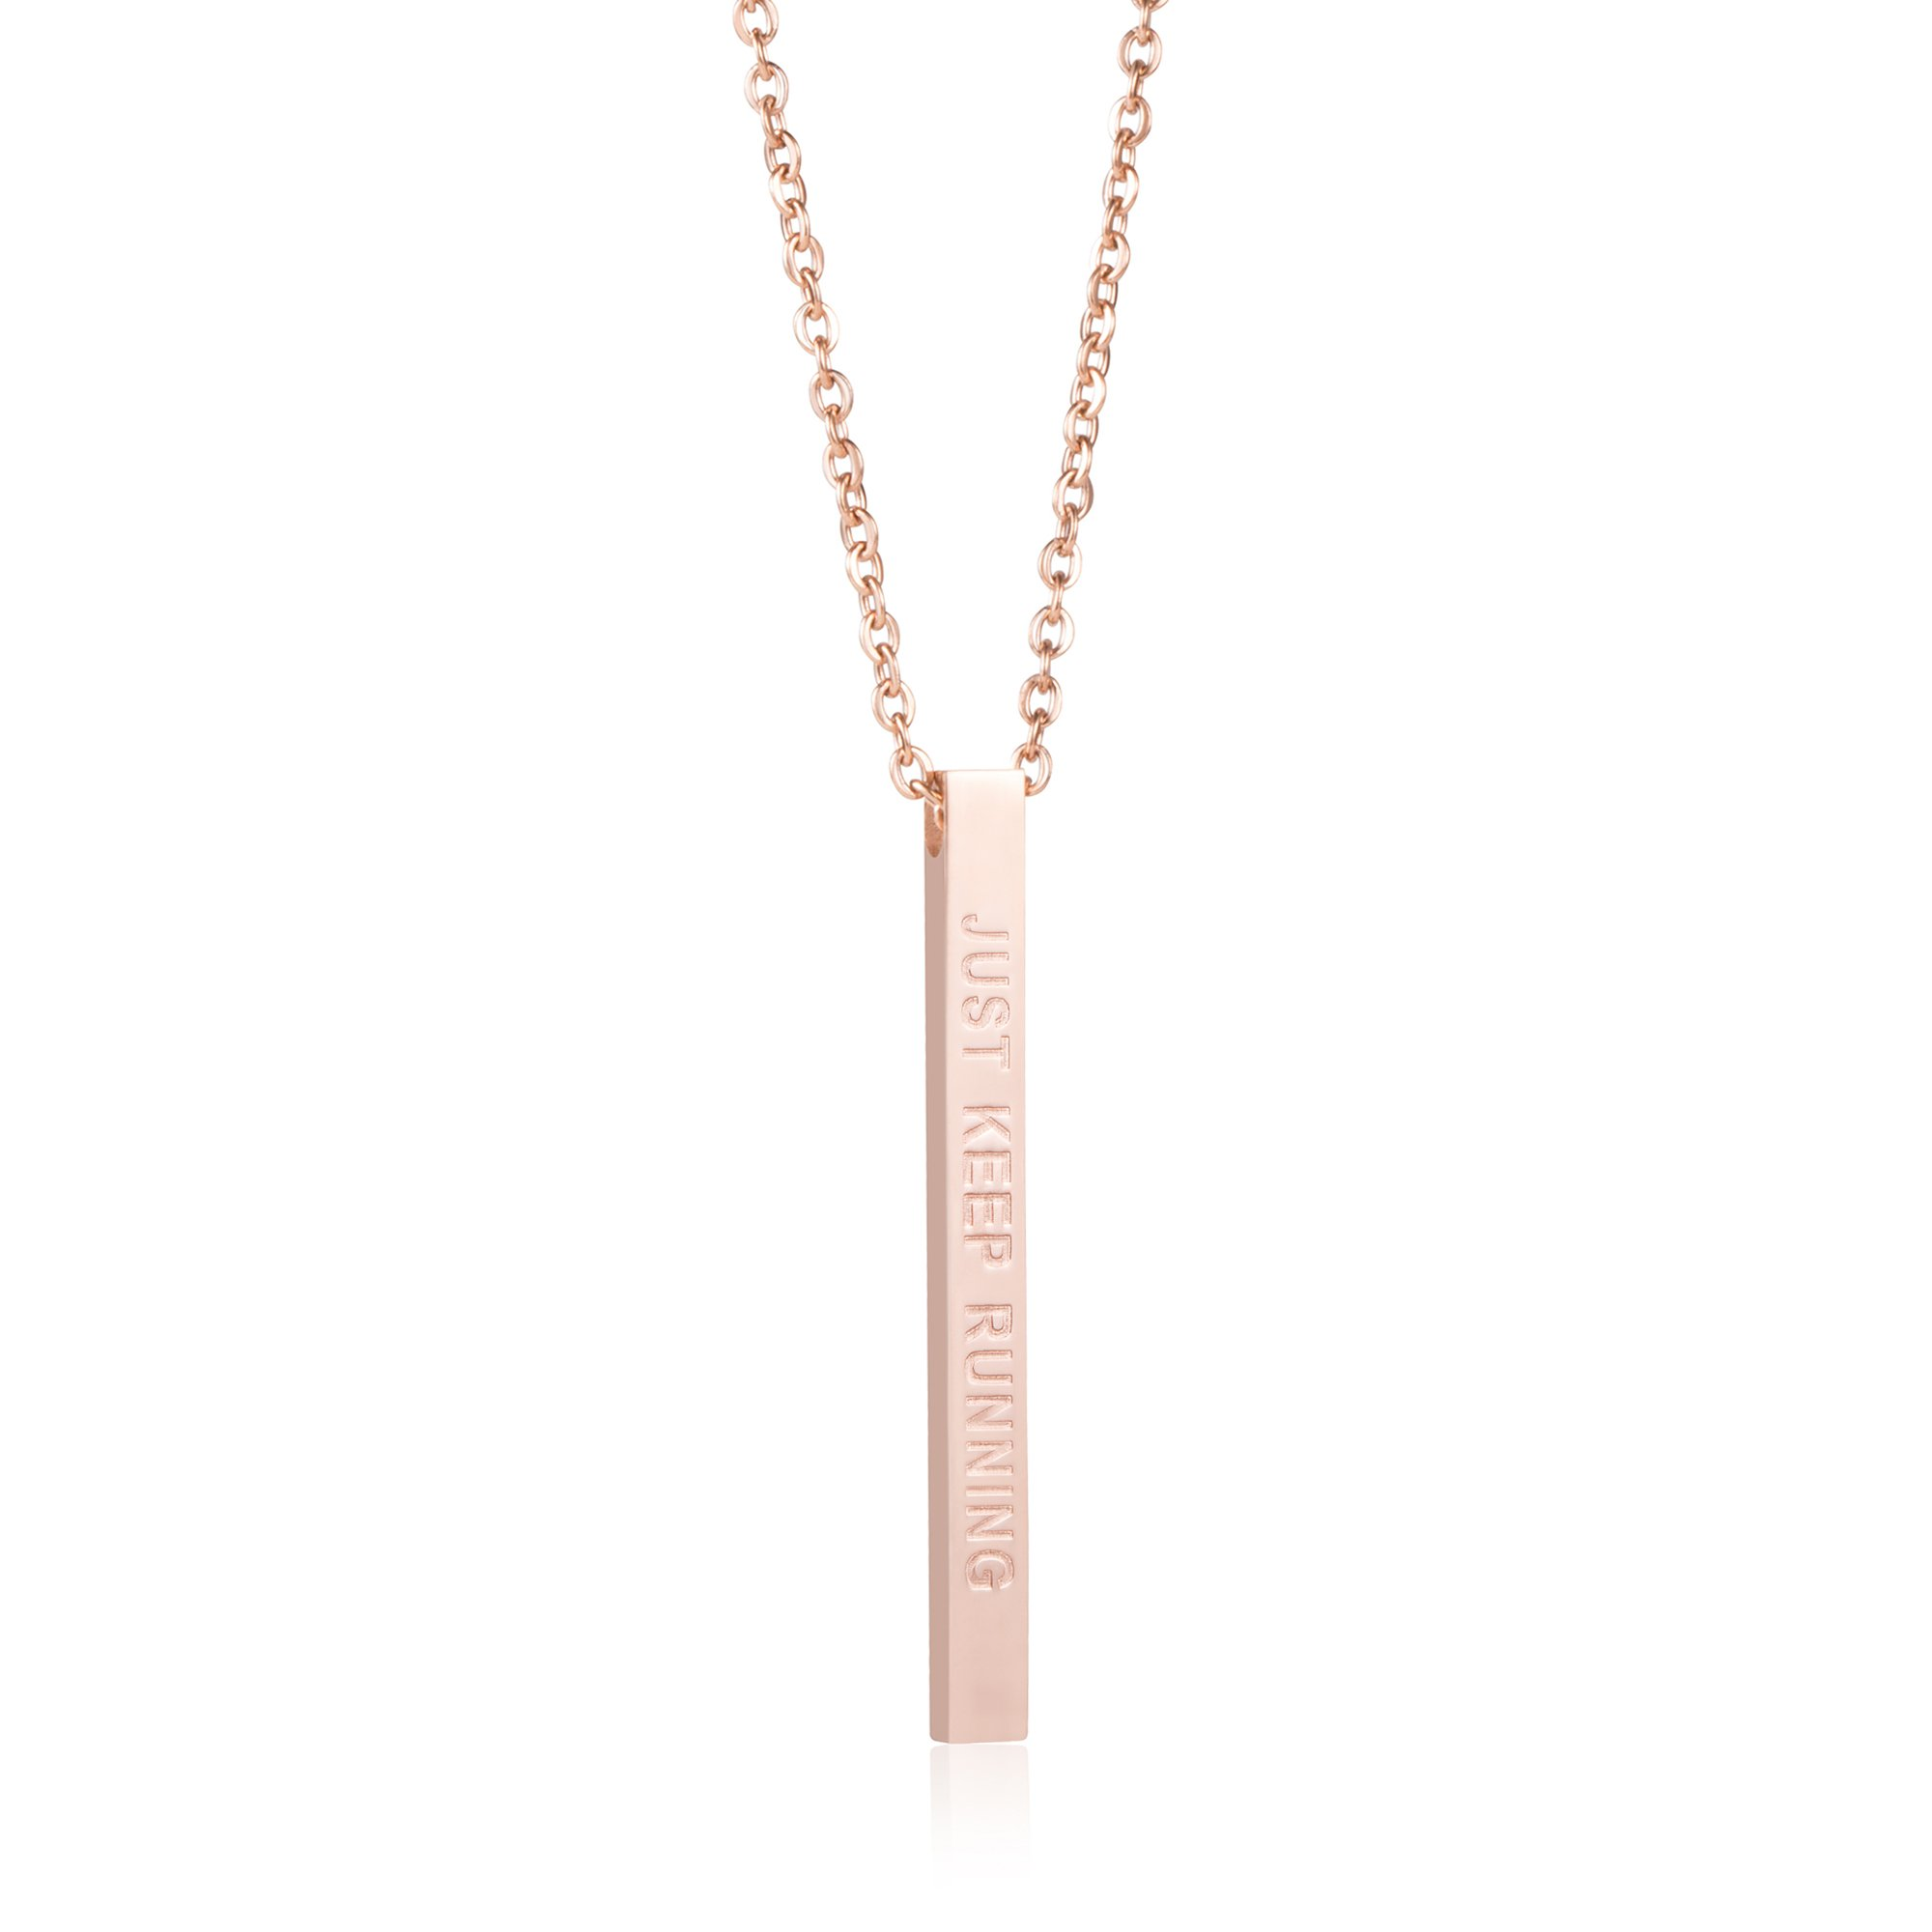 Joycuff Runner Gift Encouragement Jewelry for Women Vertical Bar Necklace Just Keep Running